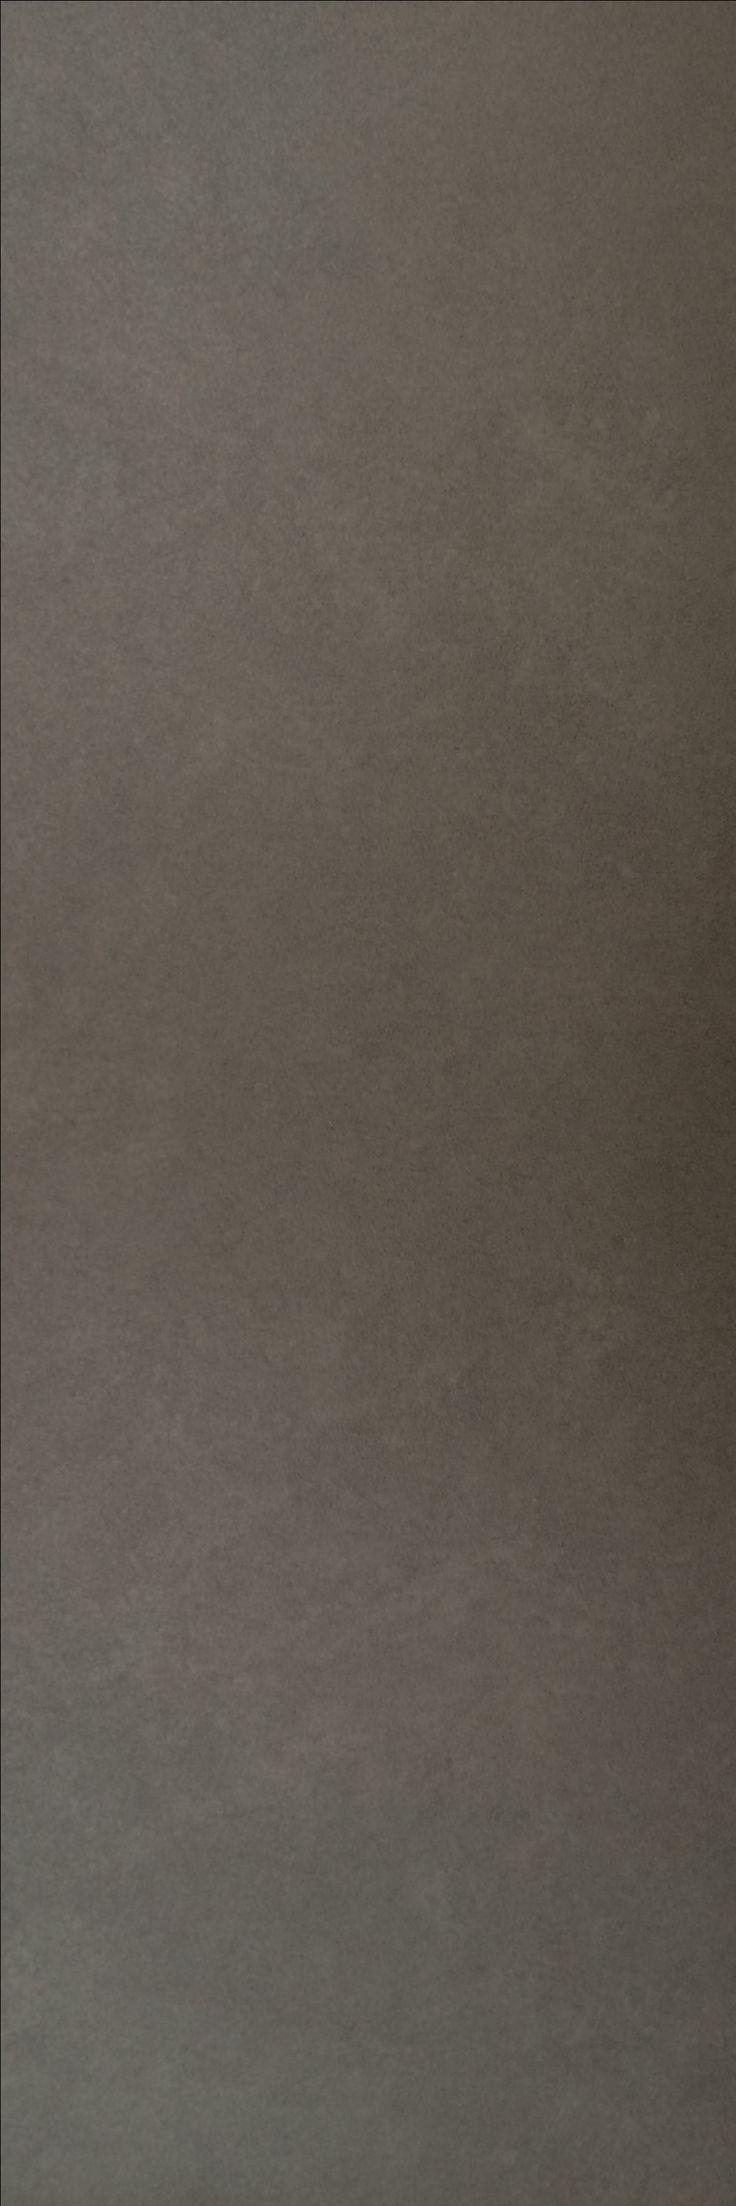 Econ Beton - karta produktu